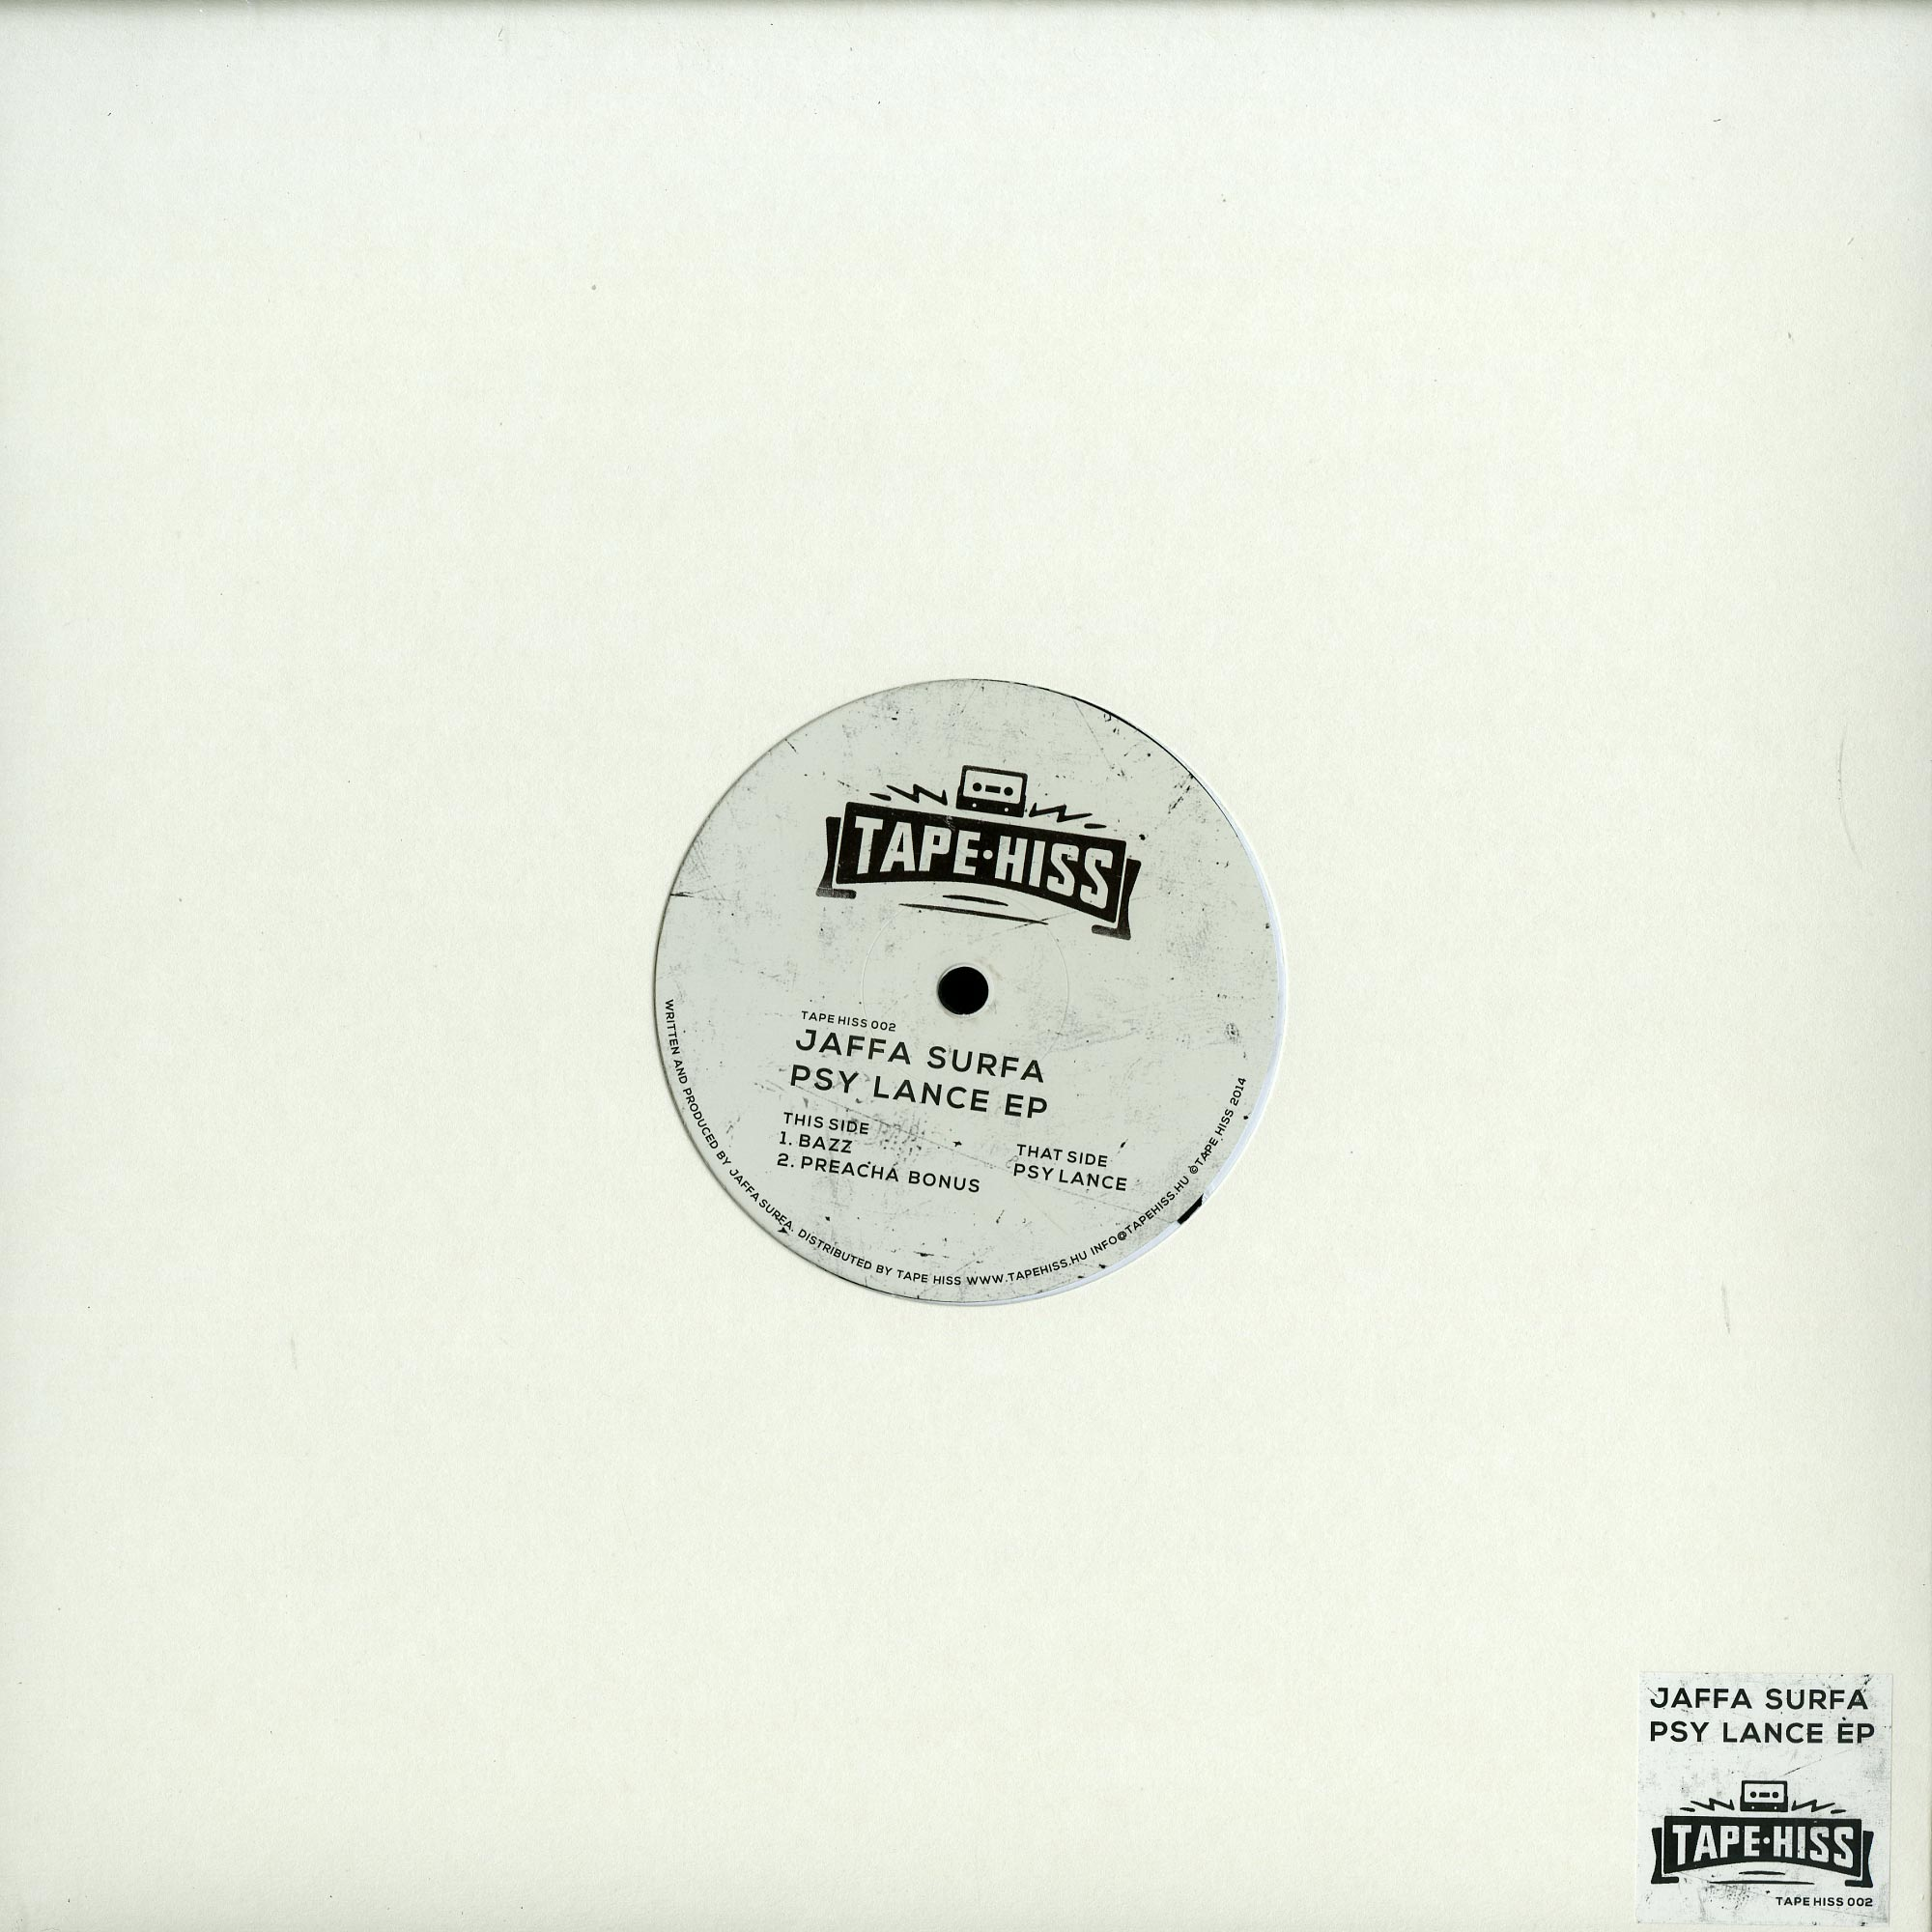 Jaffa Surfa - PSY LANCE EP